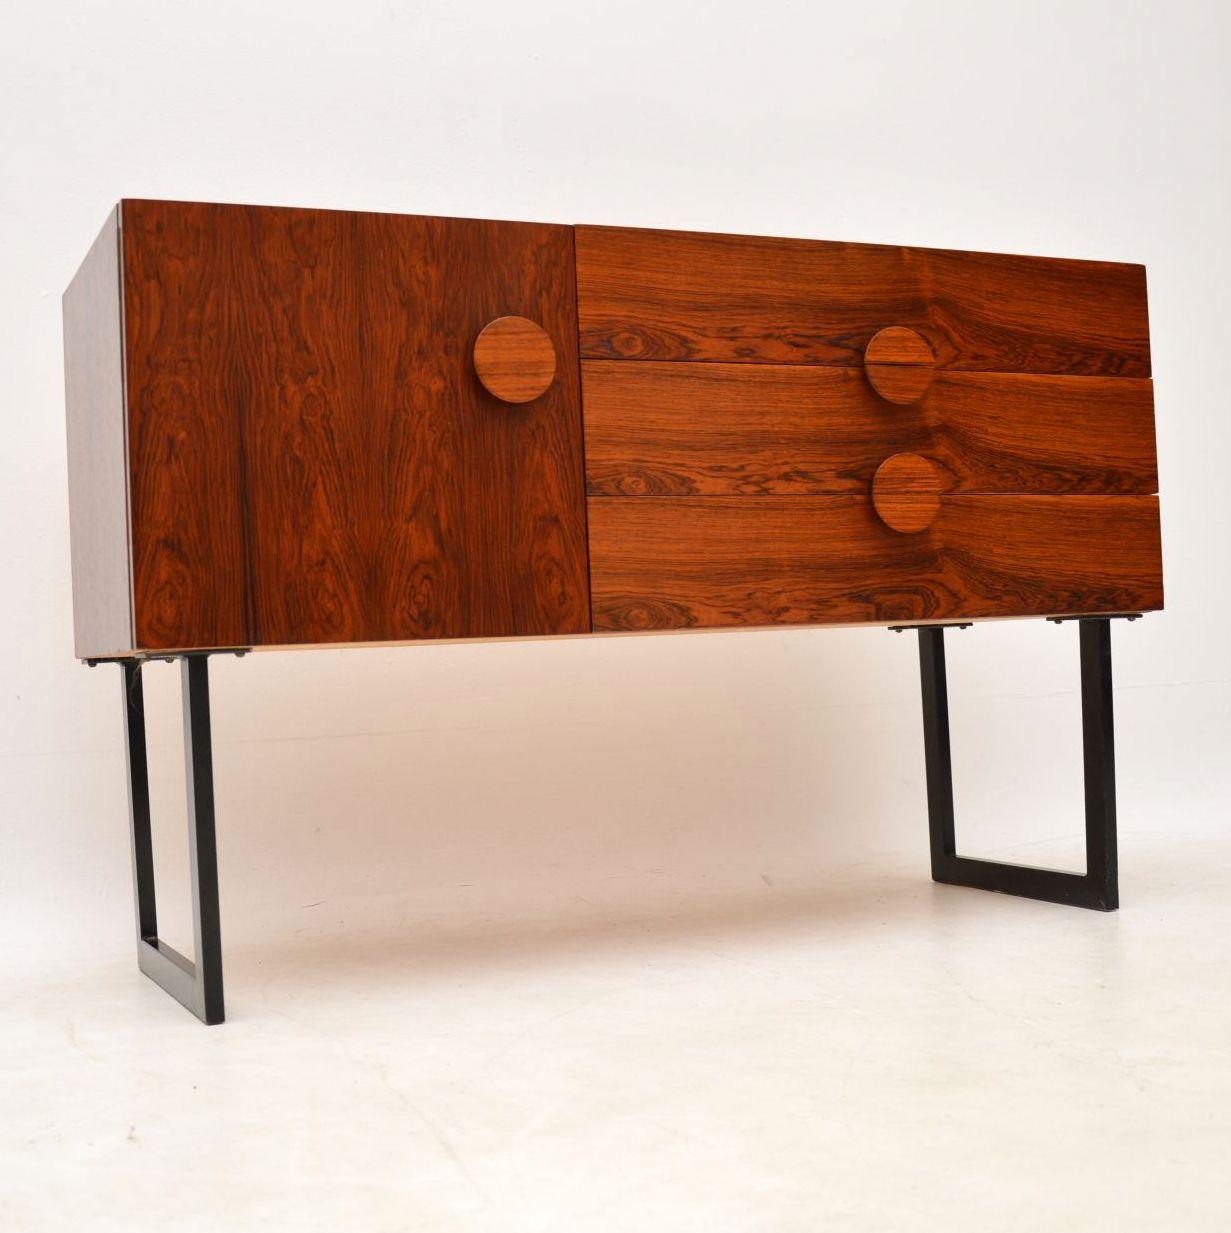 danish_rosewood_retro_vintage_sideboard_table_4